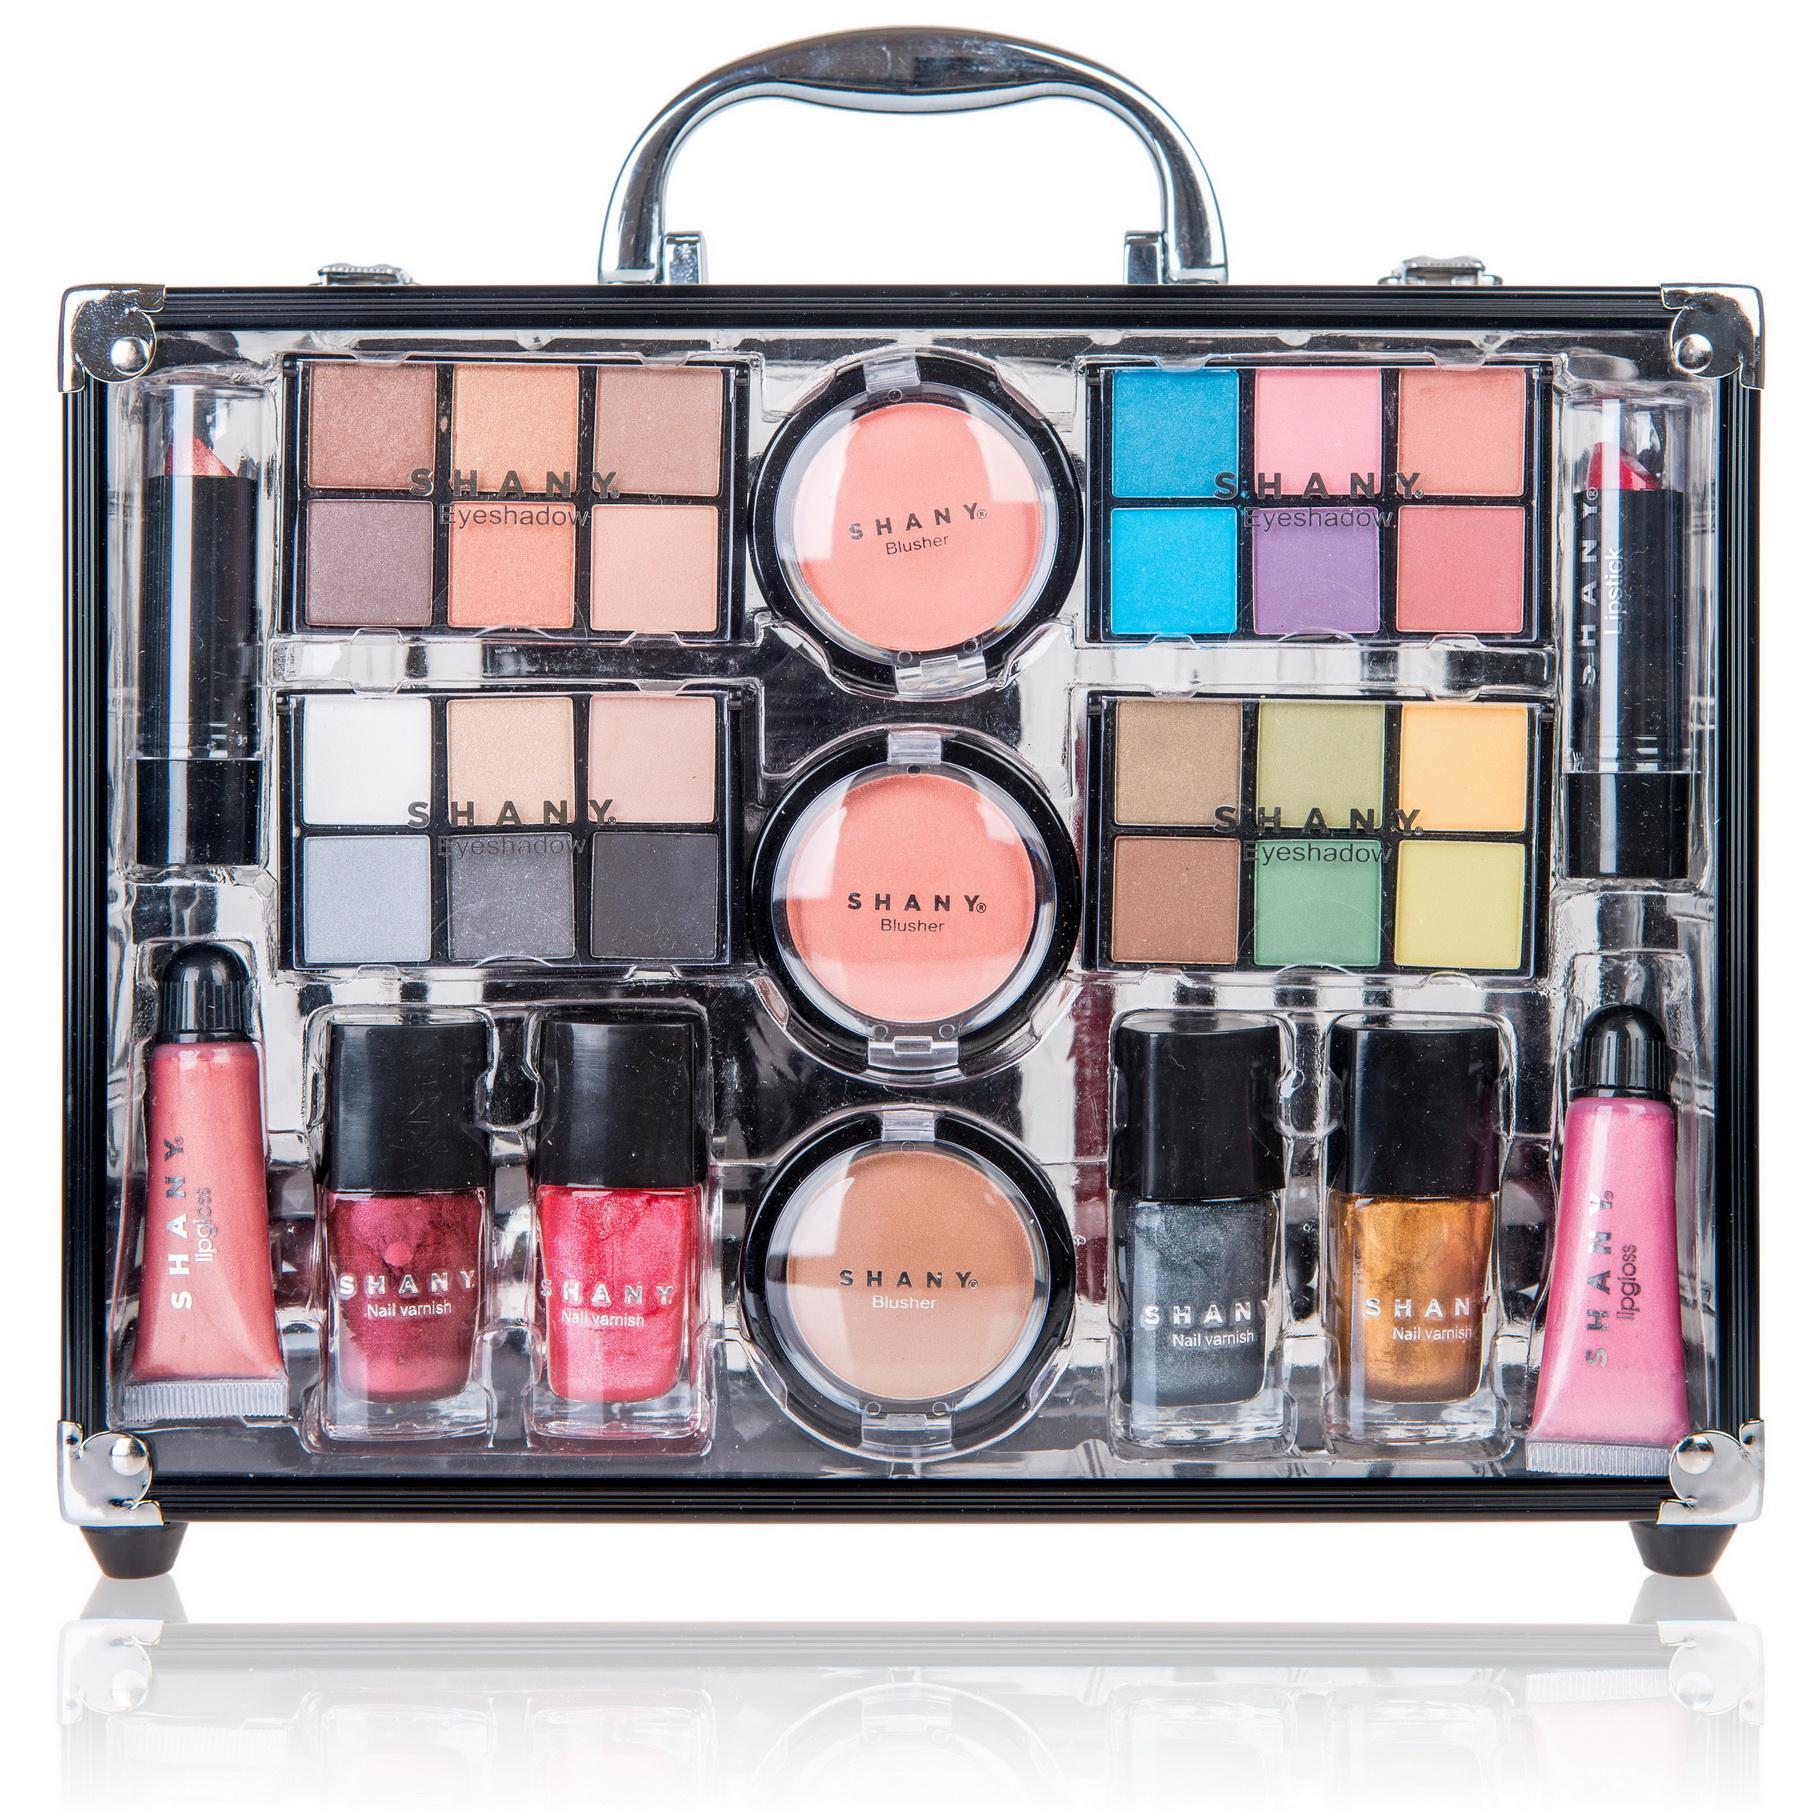 Makeup Box Set In India - Mugeek Vidalondon